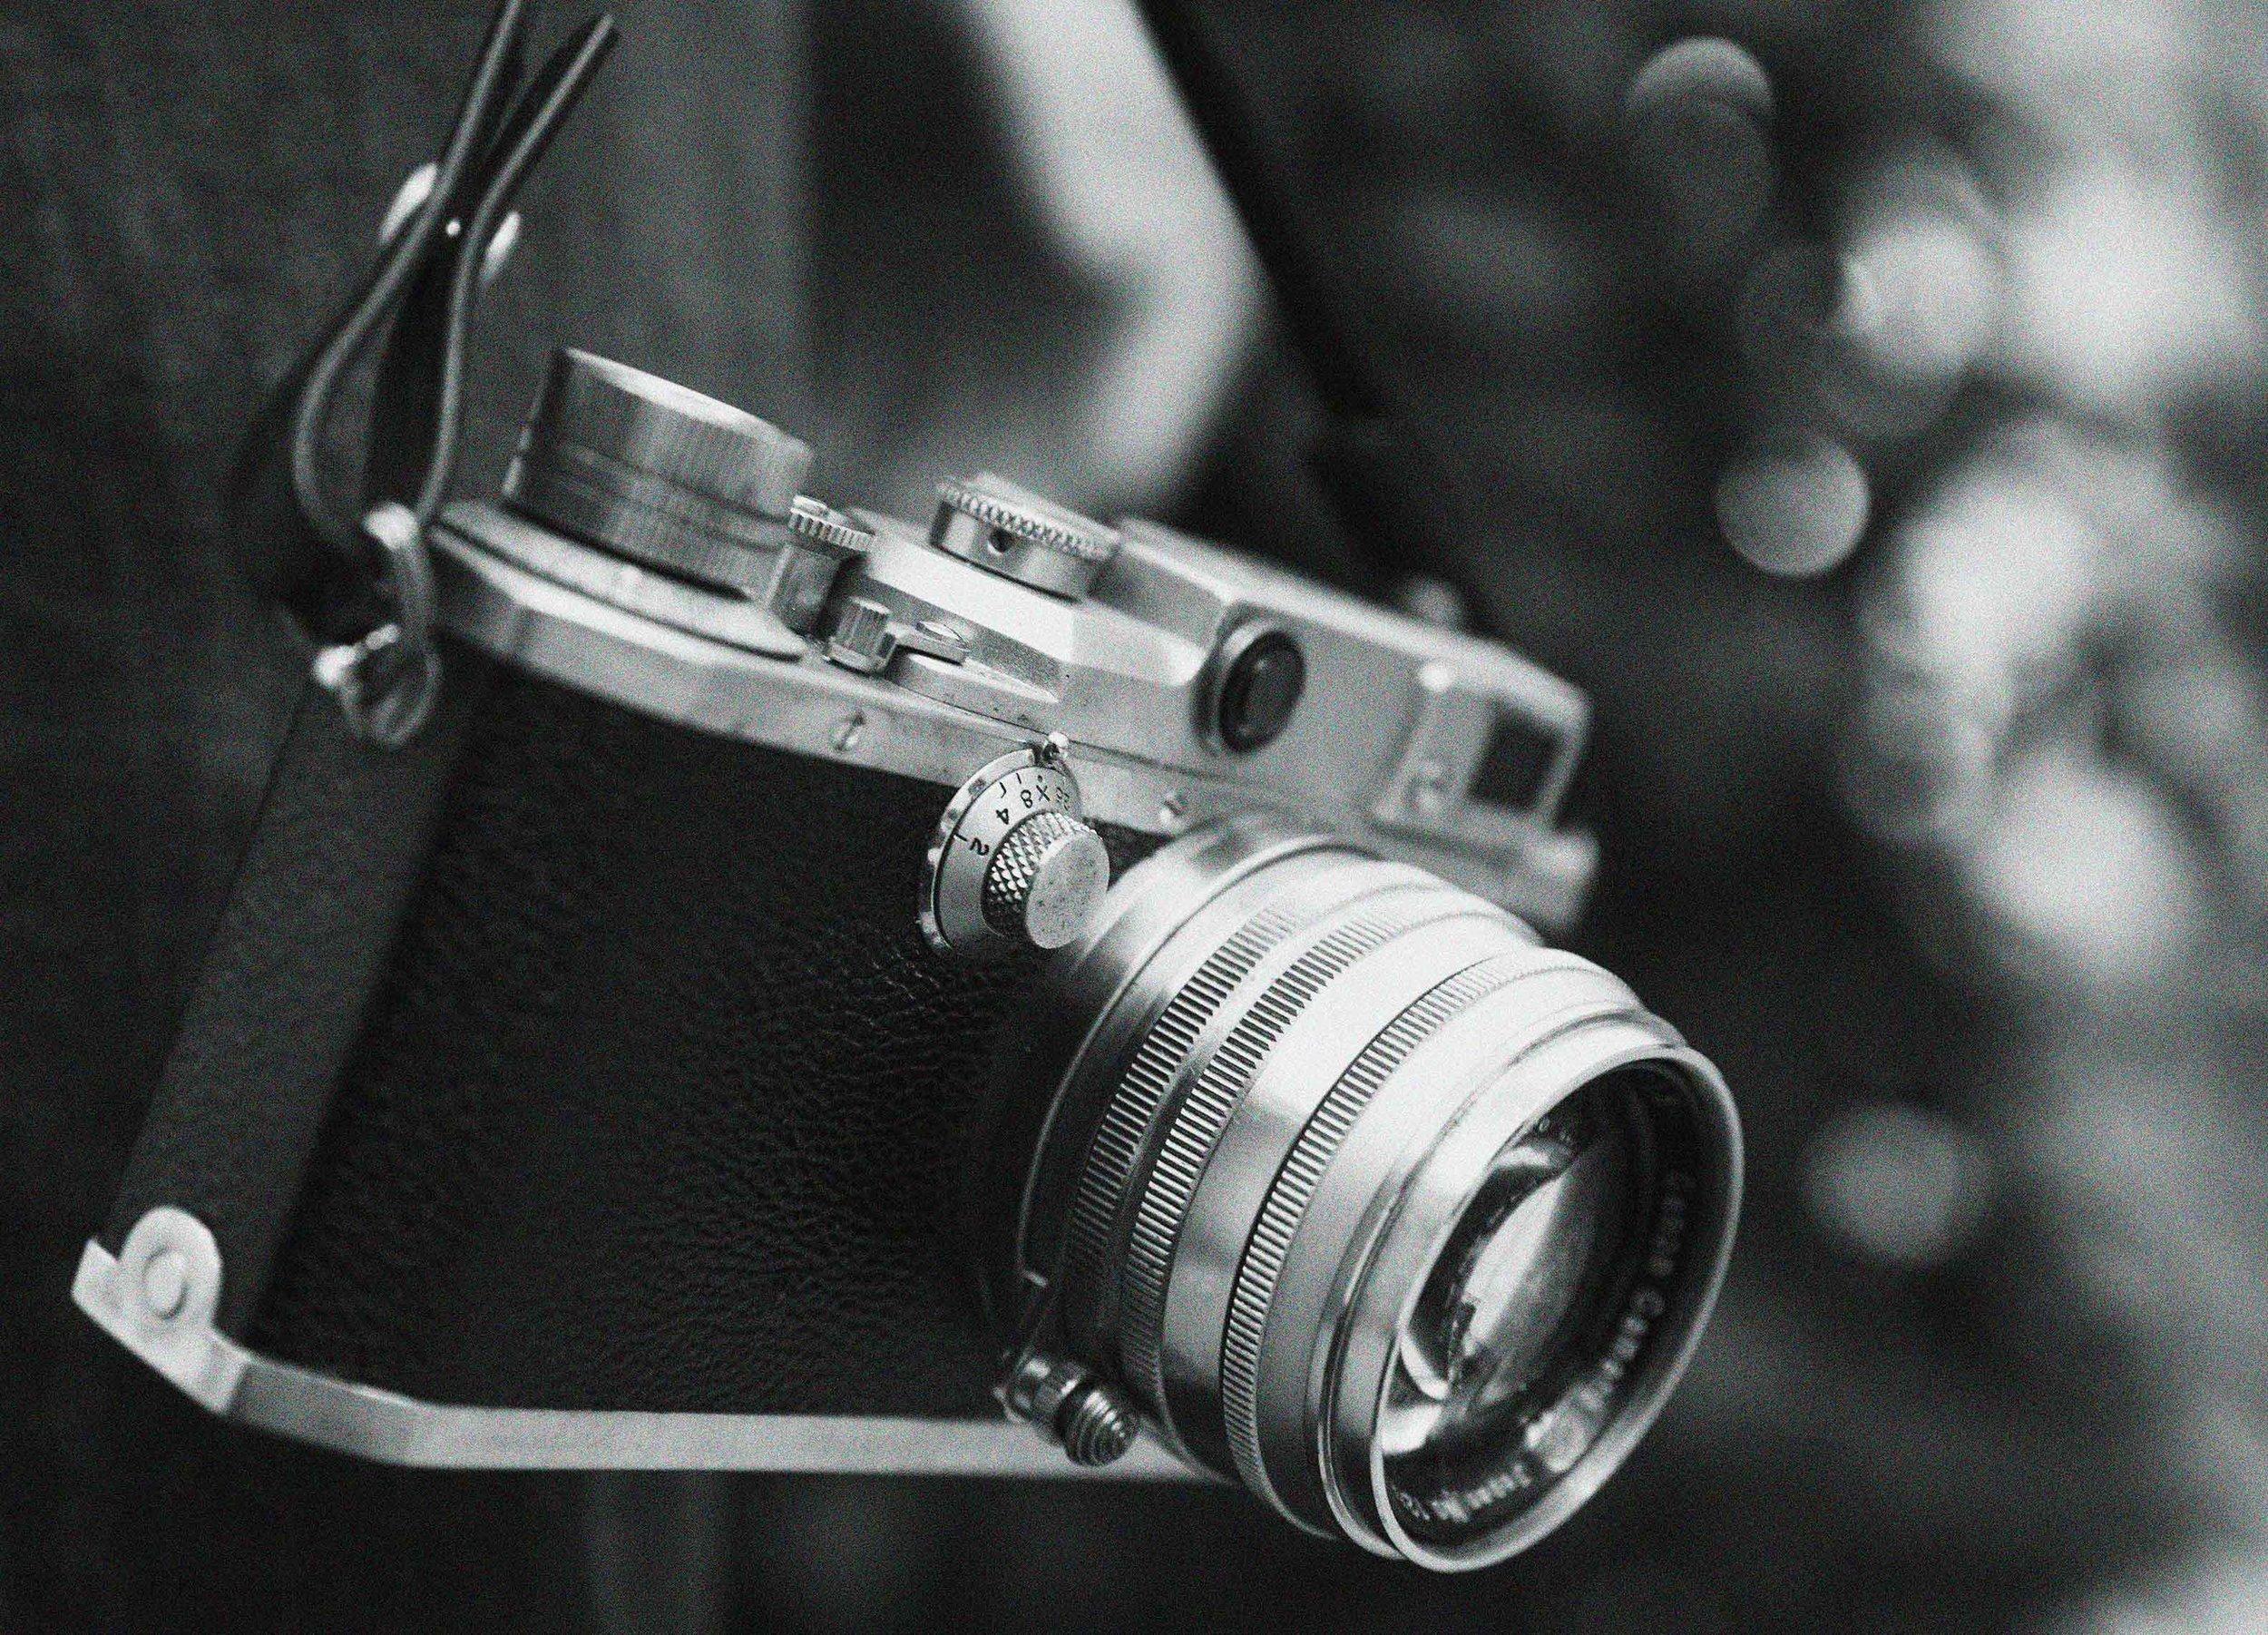 Camera_1026Edit3NW.jpg